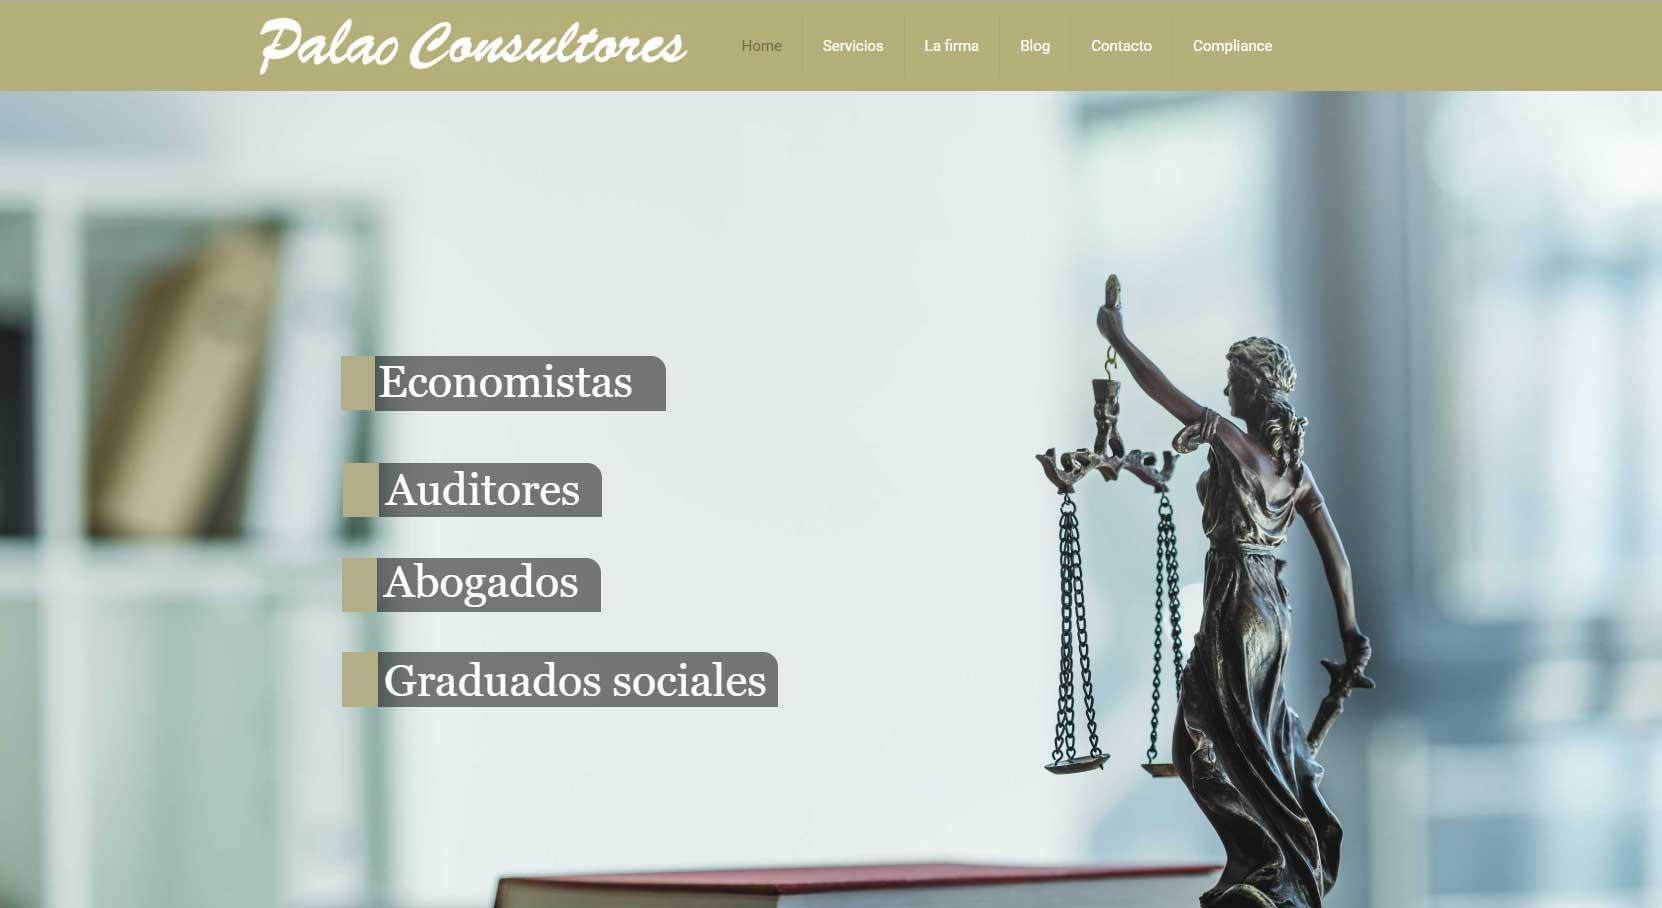 palao-consultores